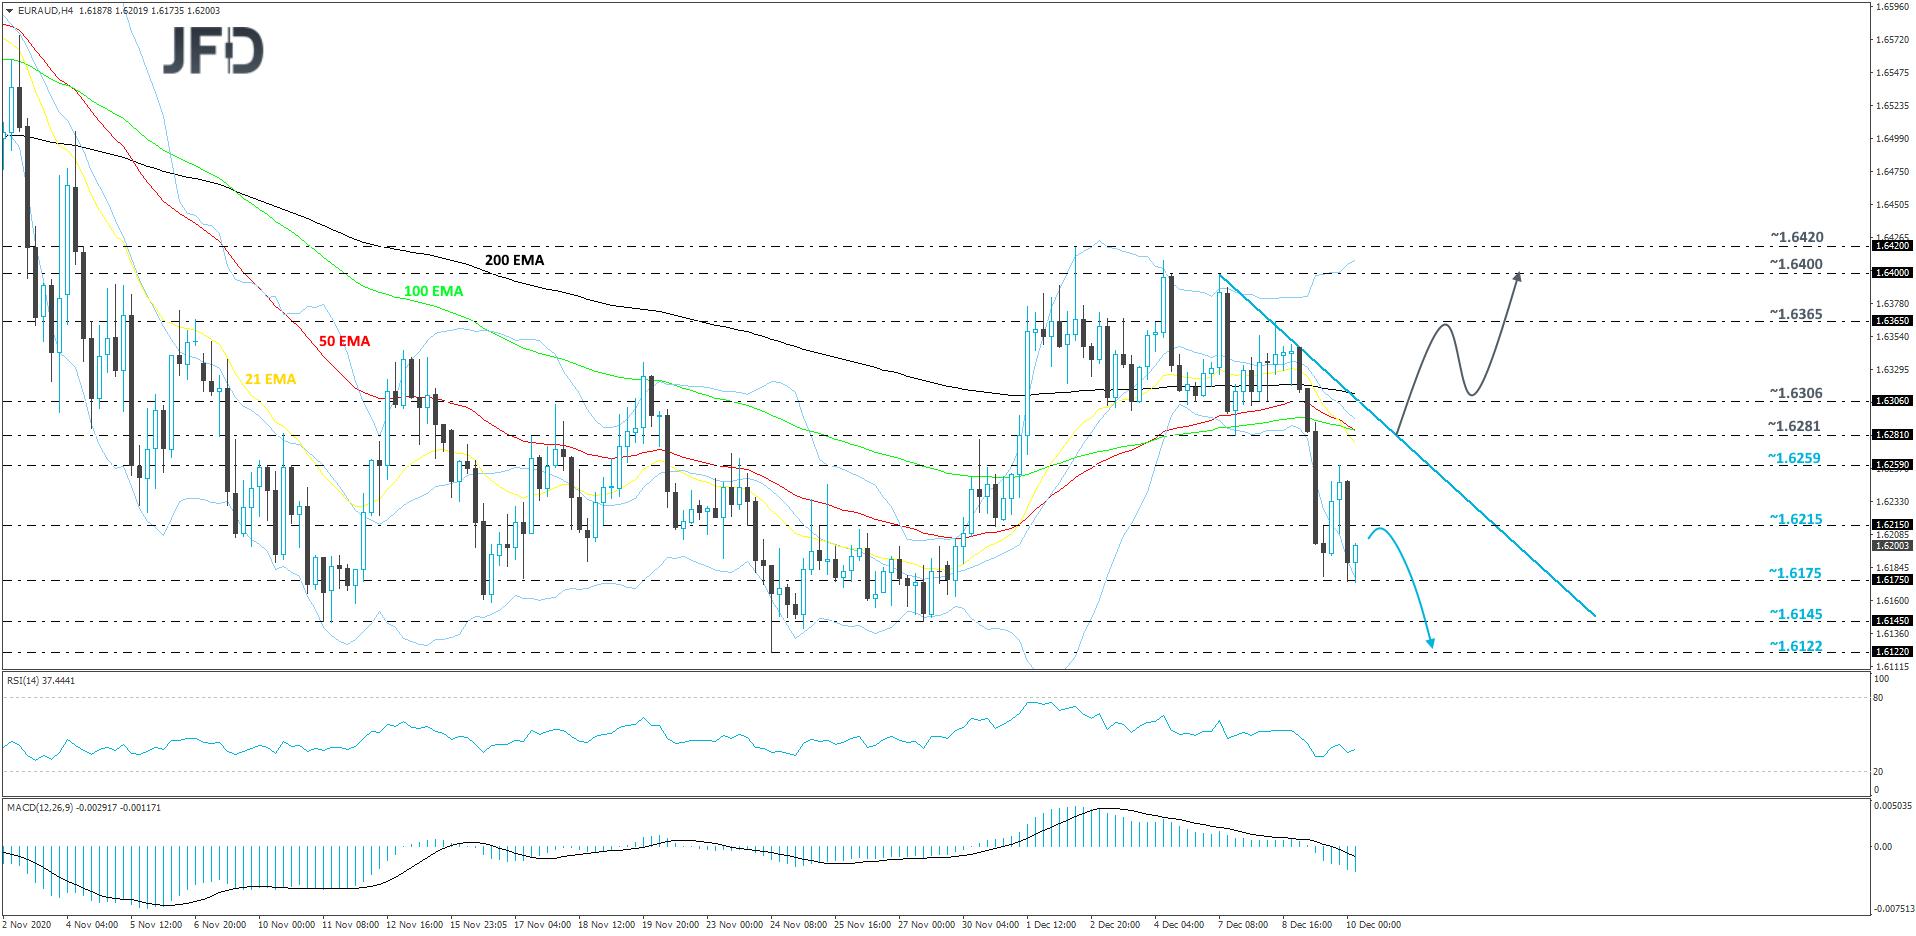 EUR/AUD 4-hour chart technical analysis